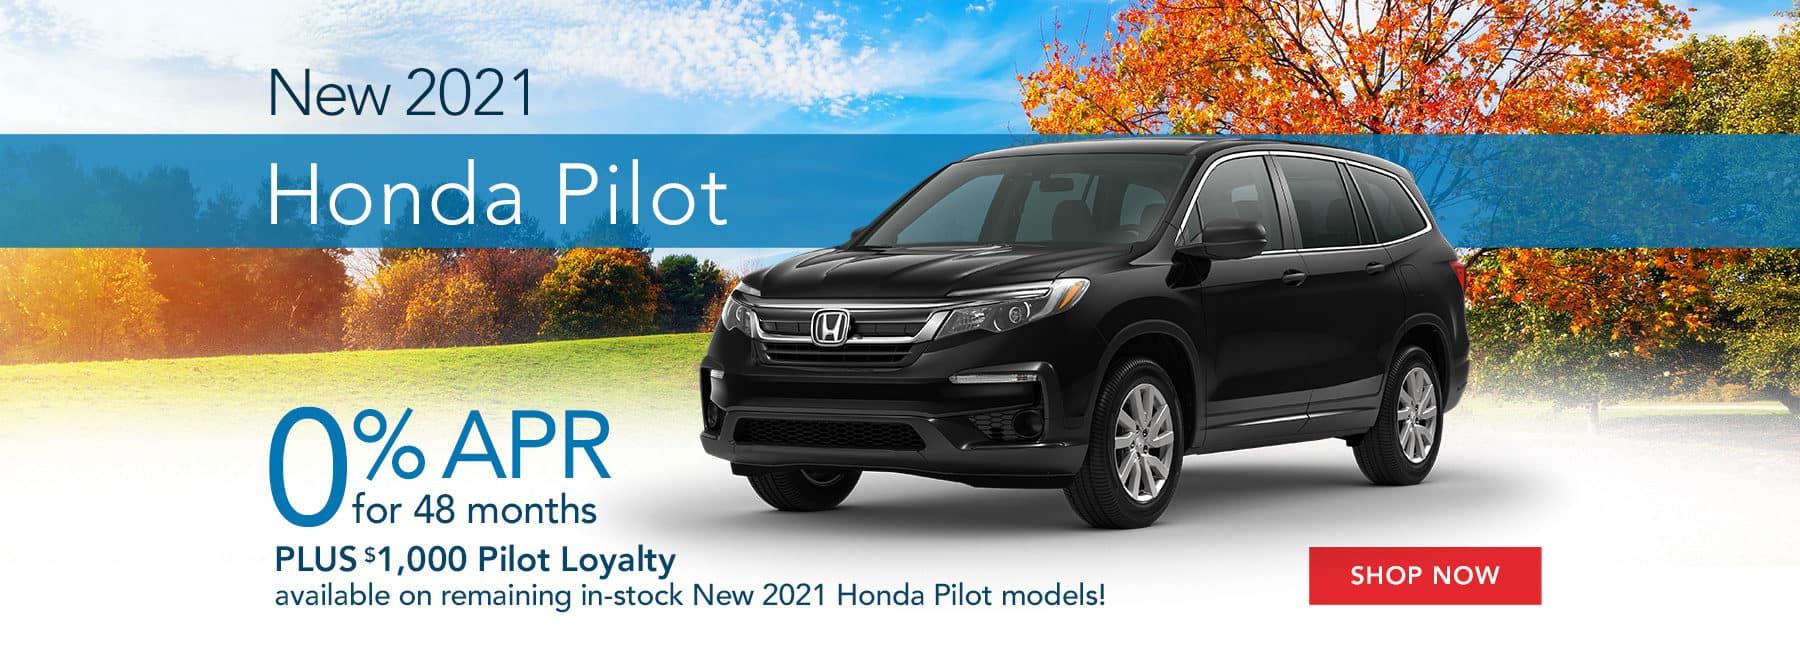 BHW_1800x663_New 2021 Honda Pilot_09'21